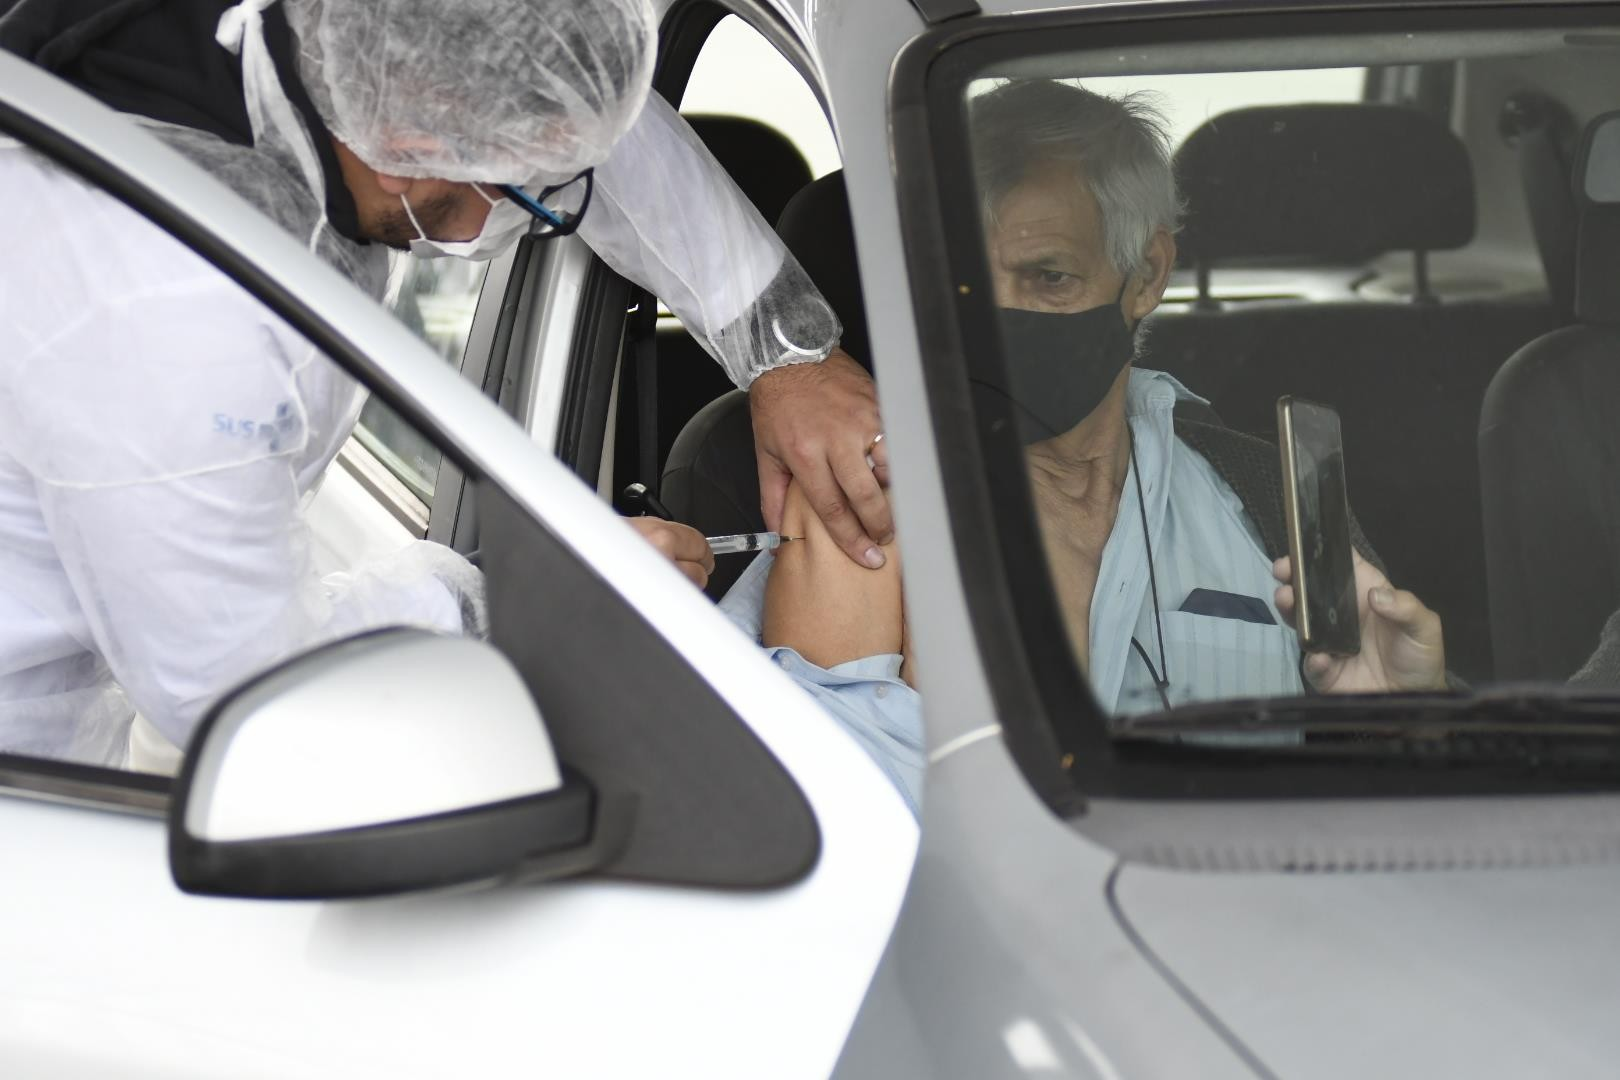 SP começa a vacinar idosos de 64 anos nesta sexta-feira